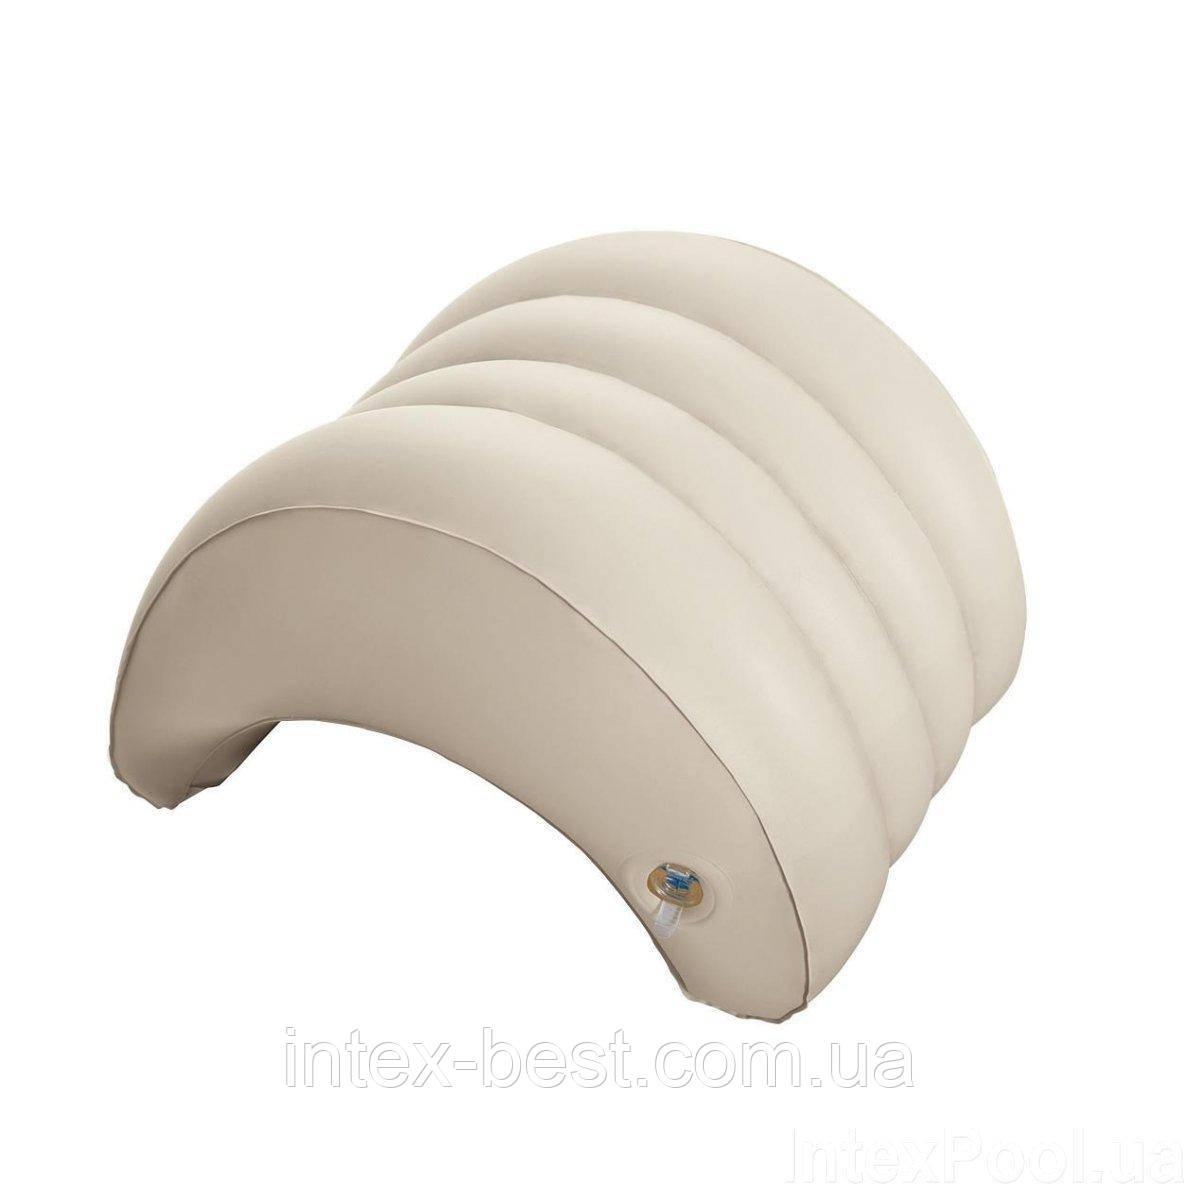 Подголовник для джакузи Intex 28501 (39х30х23 см)